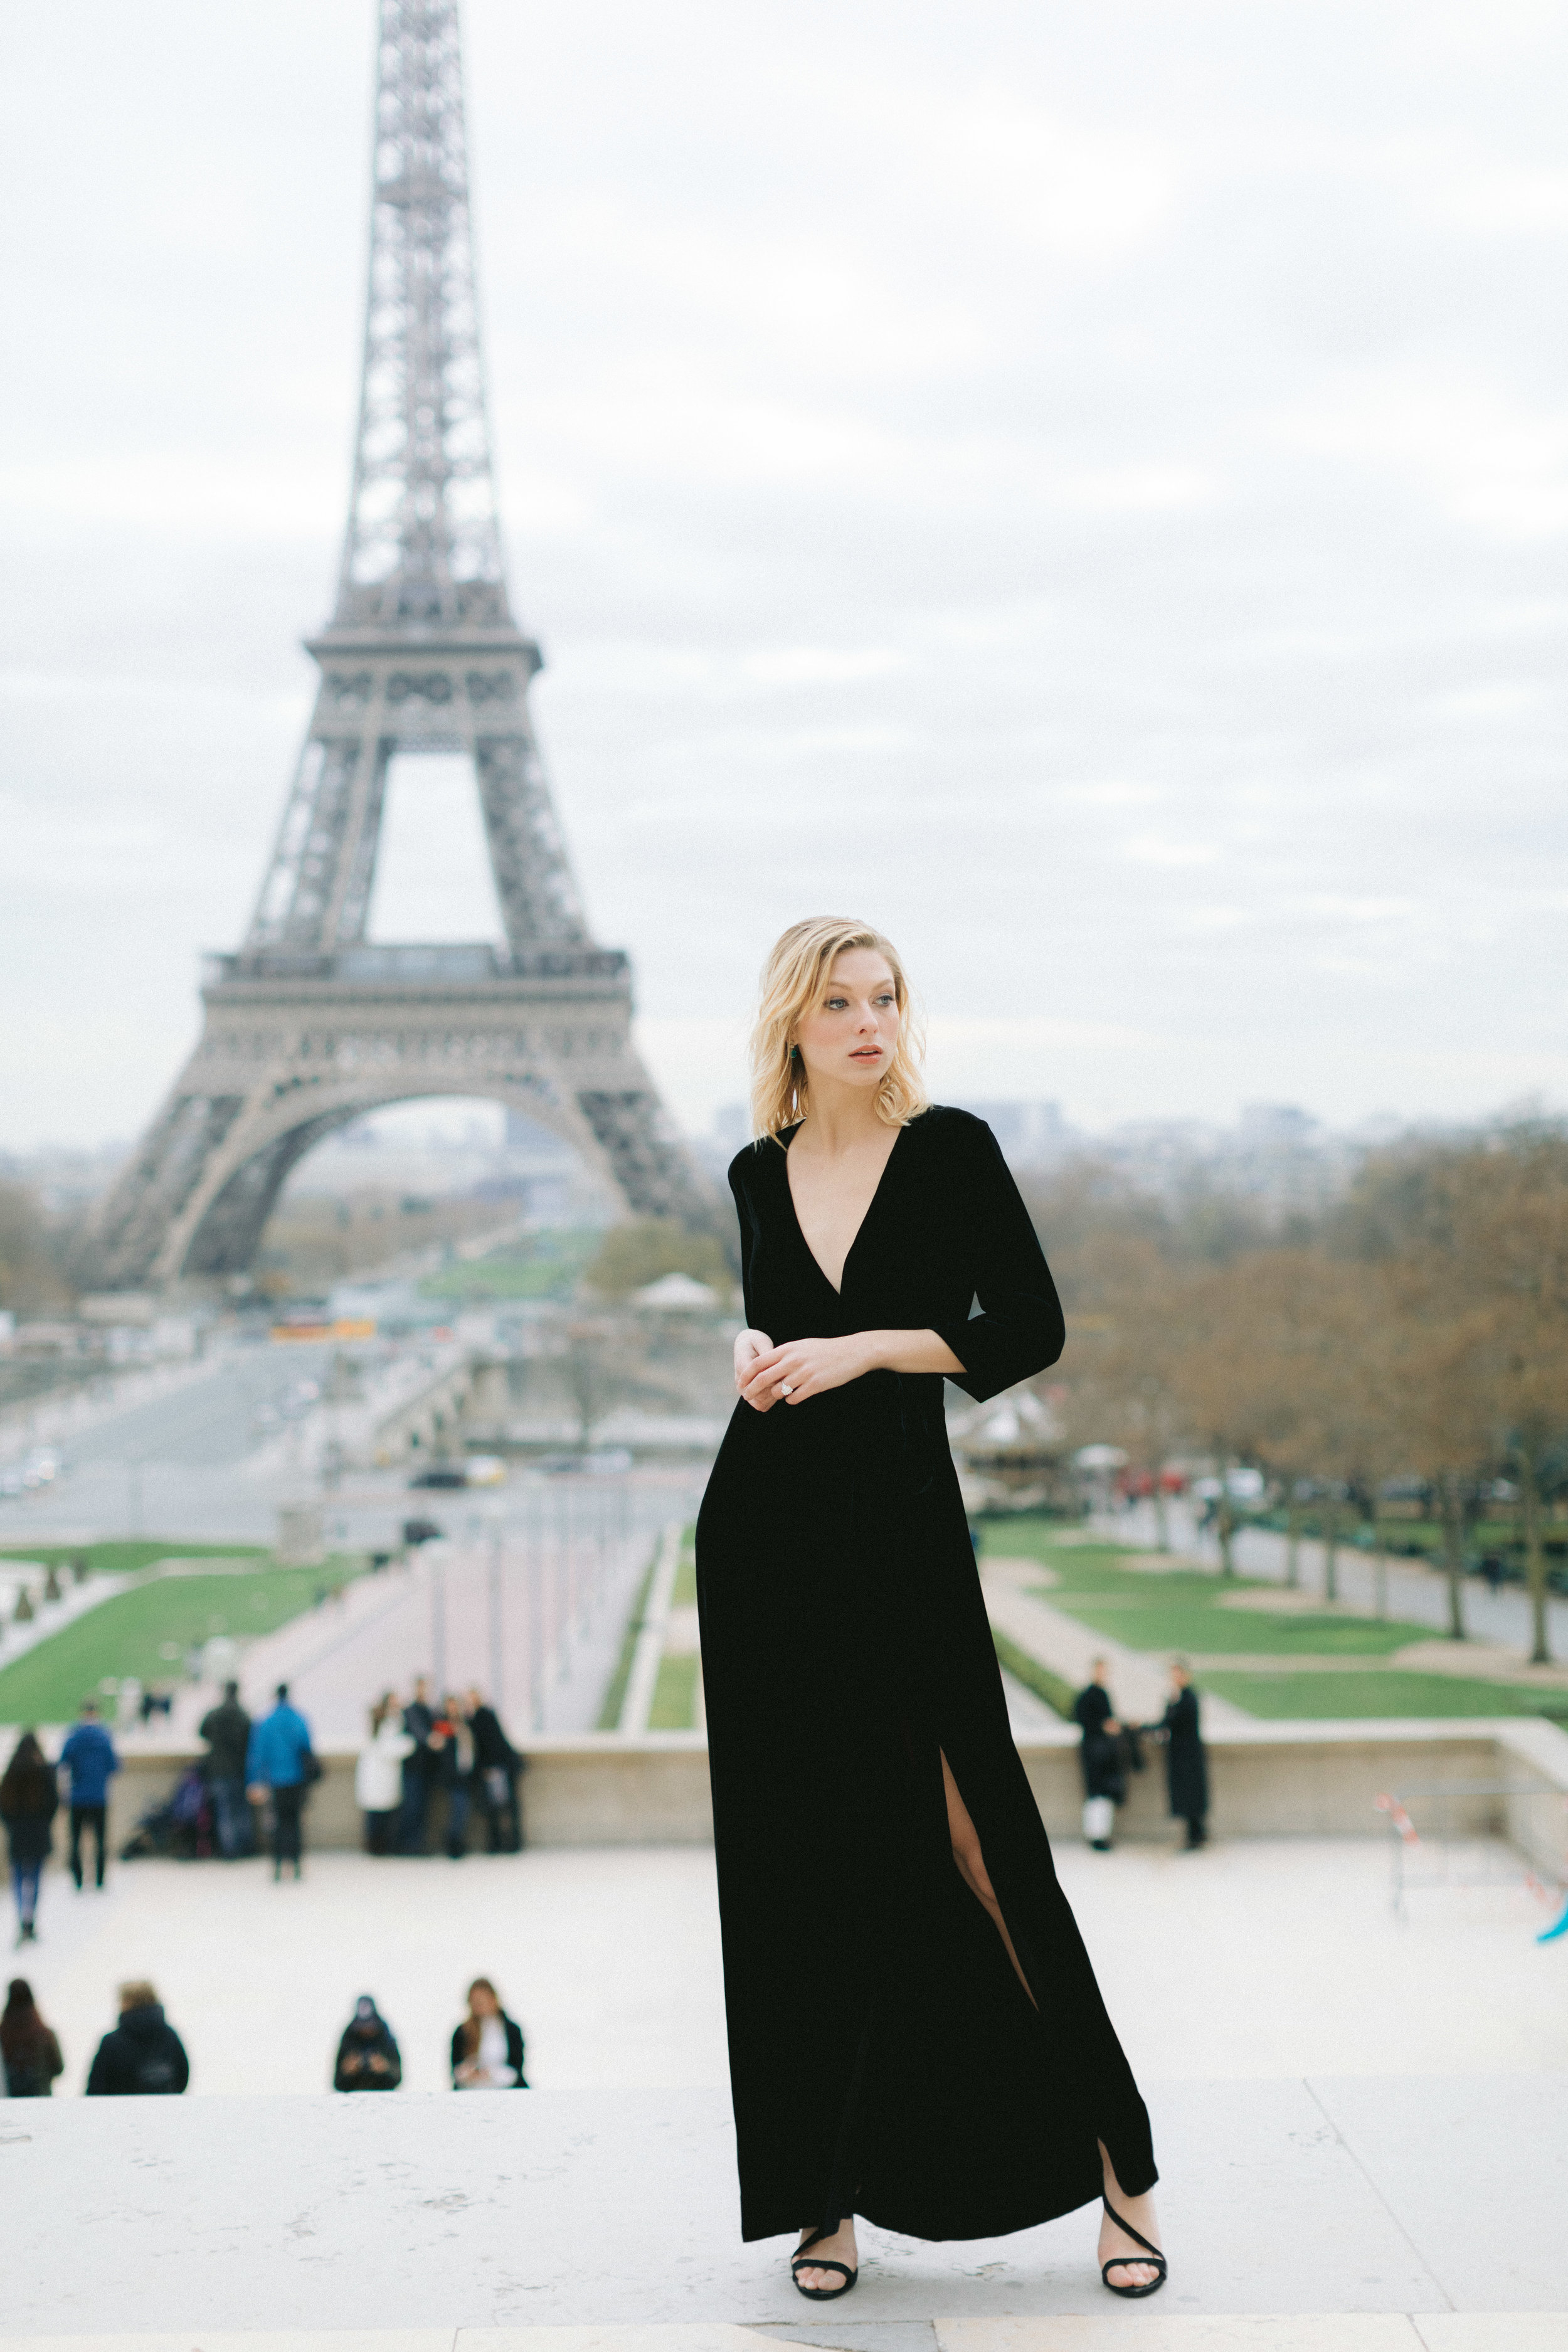 JennyQuicksallPhotography_www.jennyquicksall.com_ParisFranceEditorial_-285.jpg